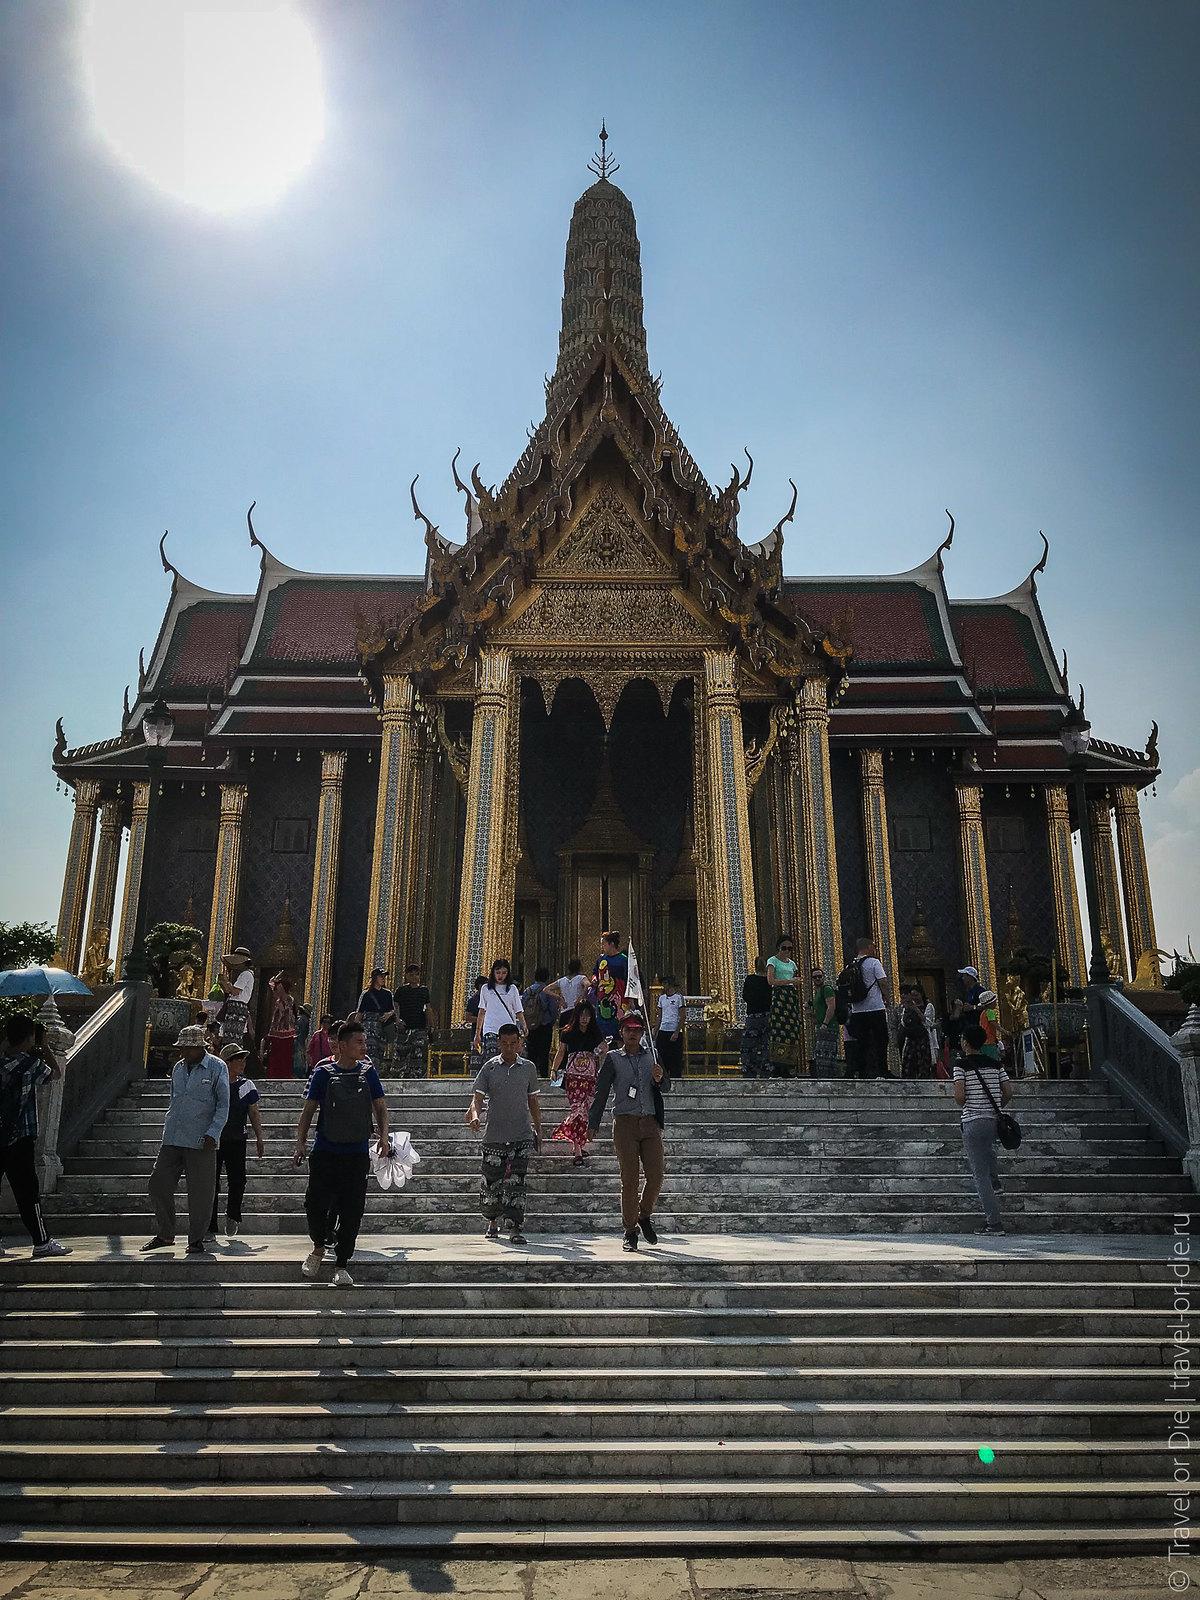 Grand-Palace-Bangkok-Королевский-дворец-Бангкок-9186